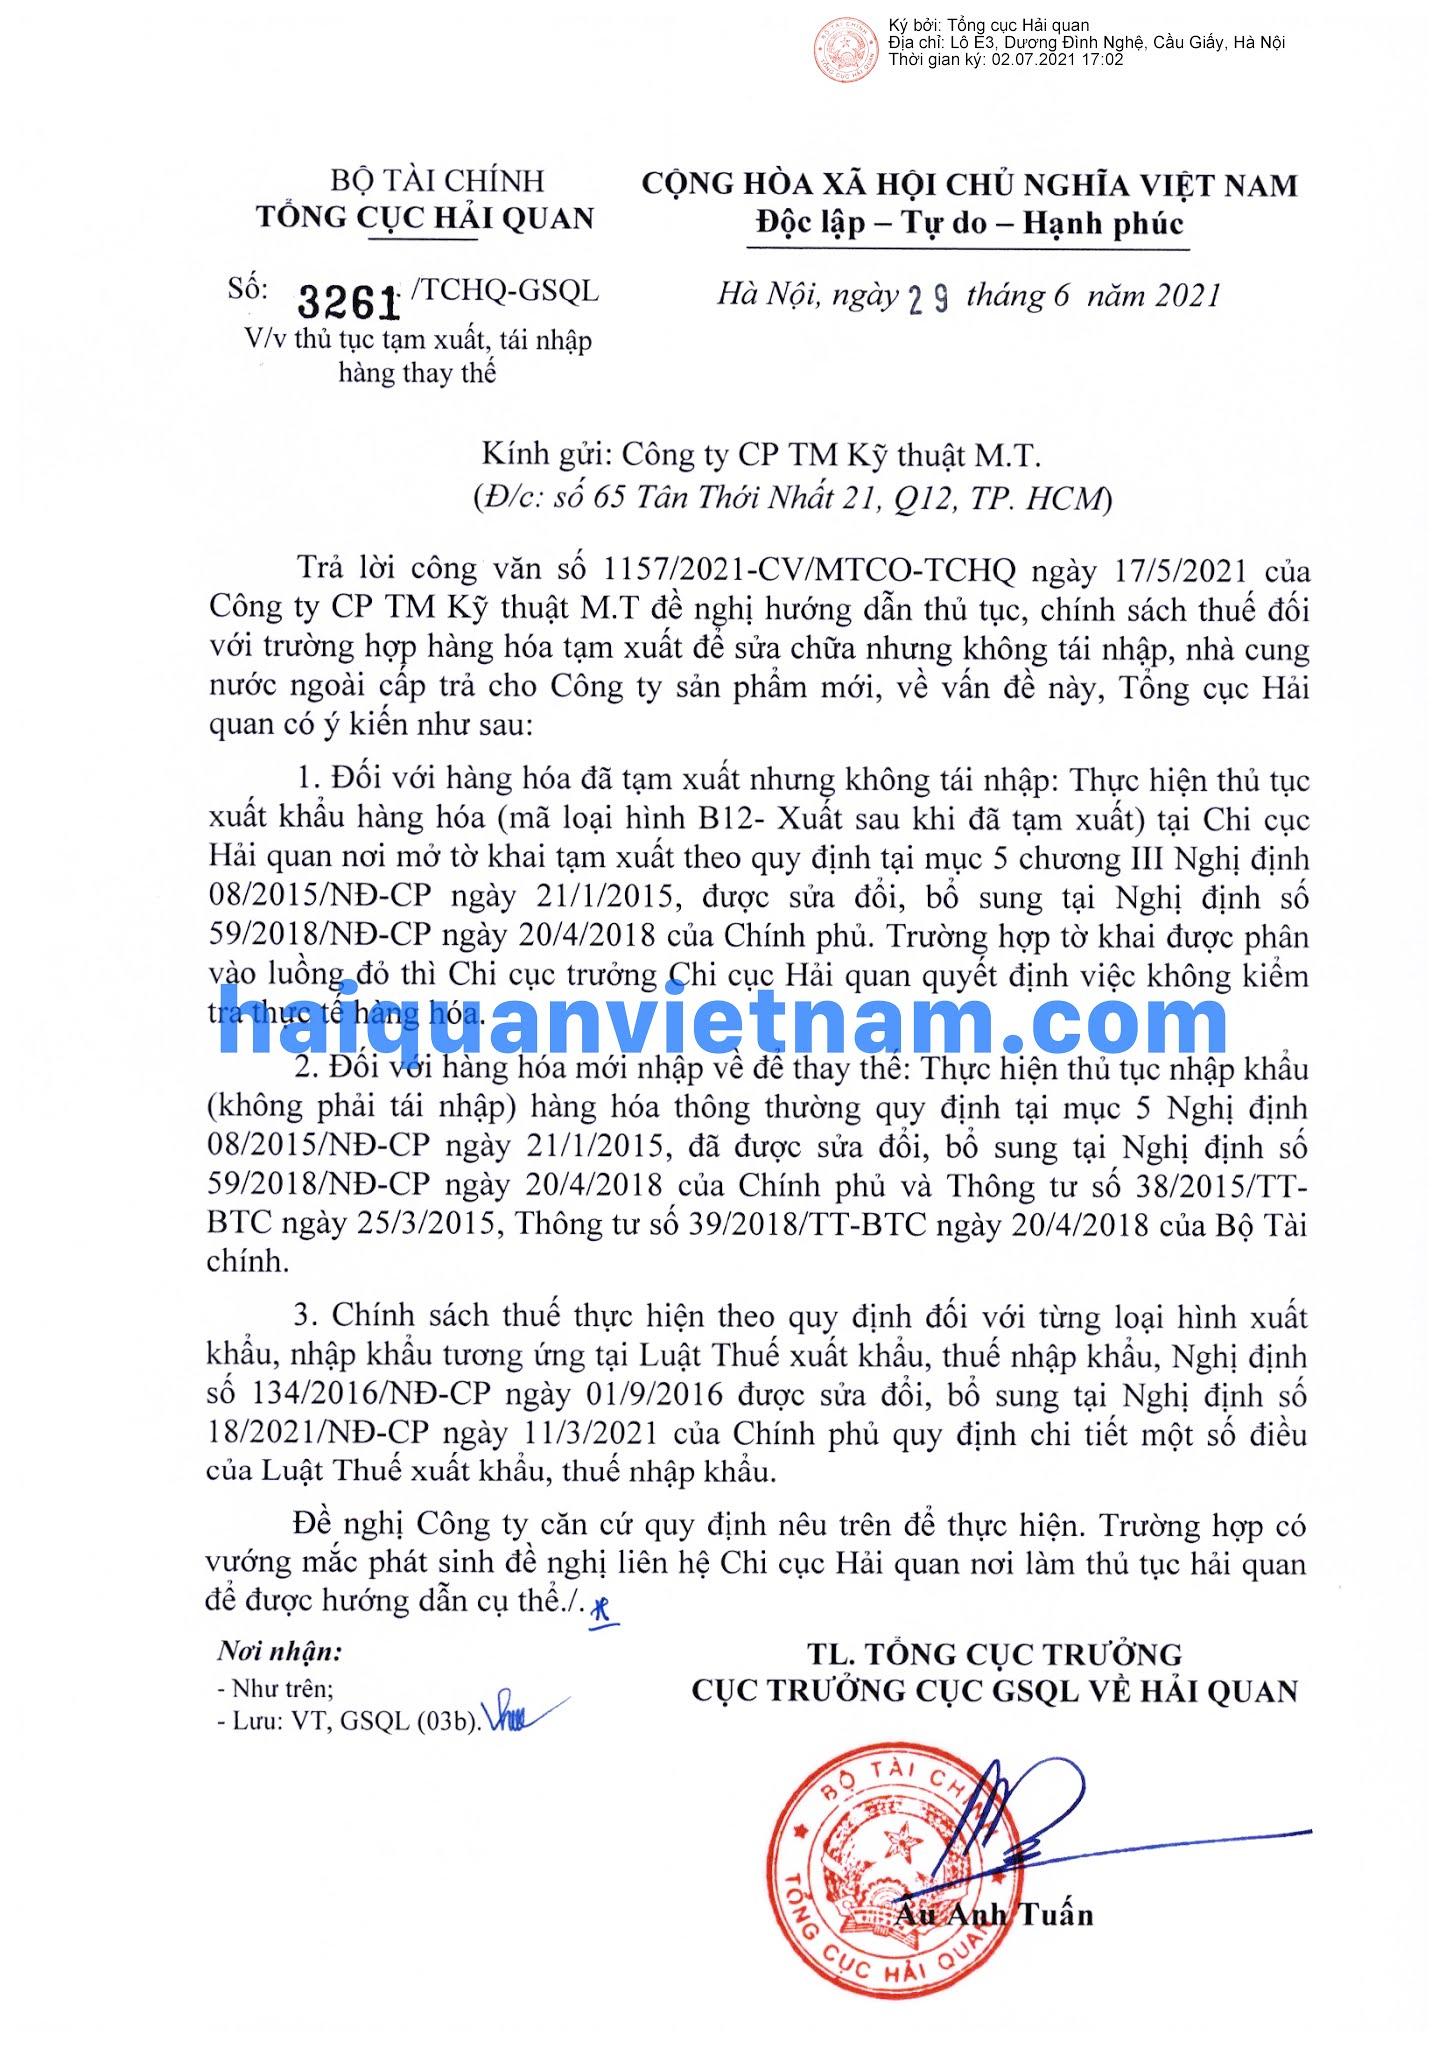 [Image: 210629-3261-TCHQ-GSQL_haiquanvietnam_01.jpg]